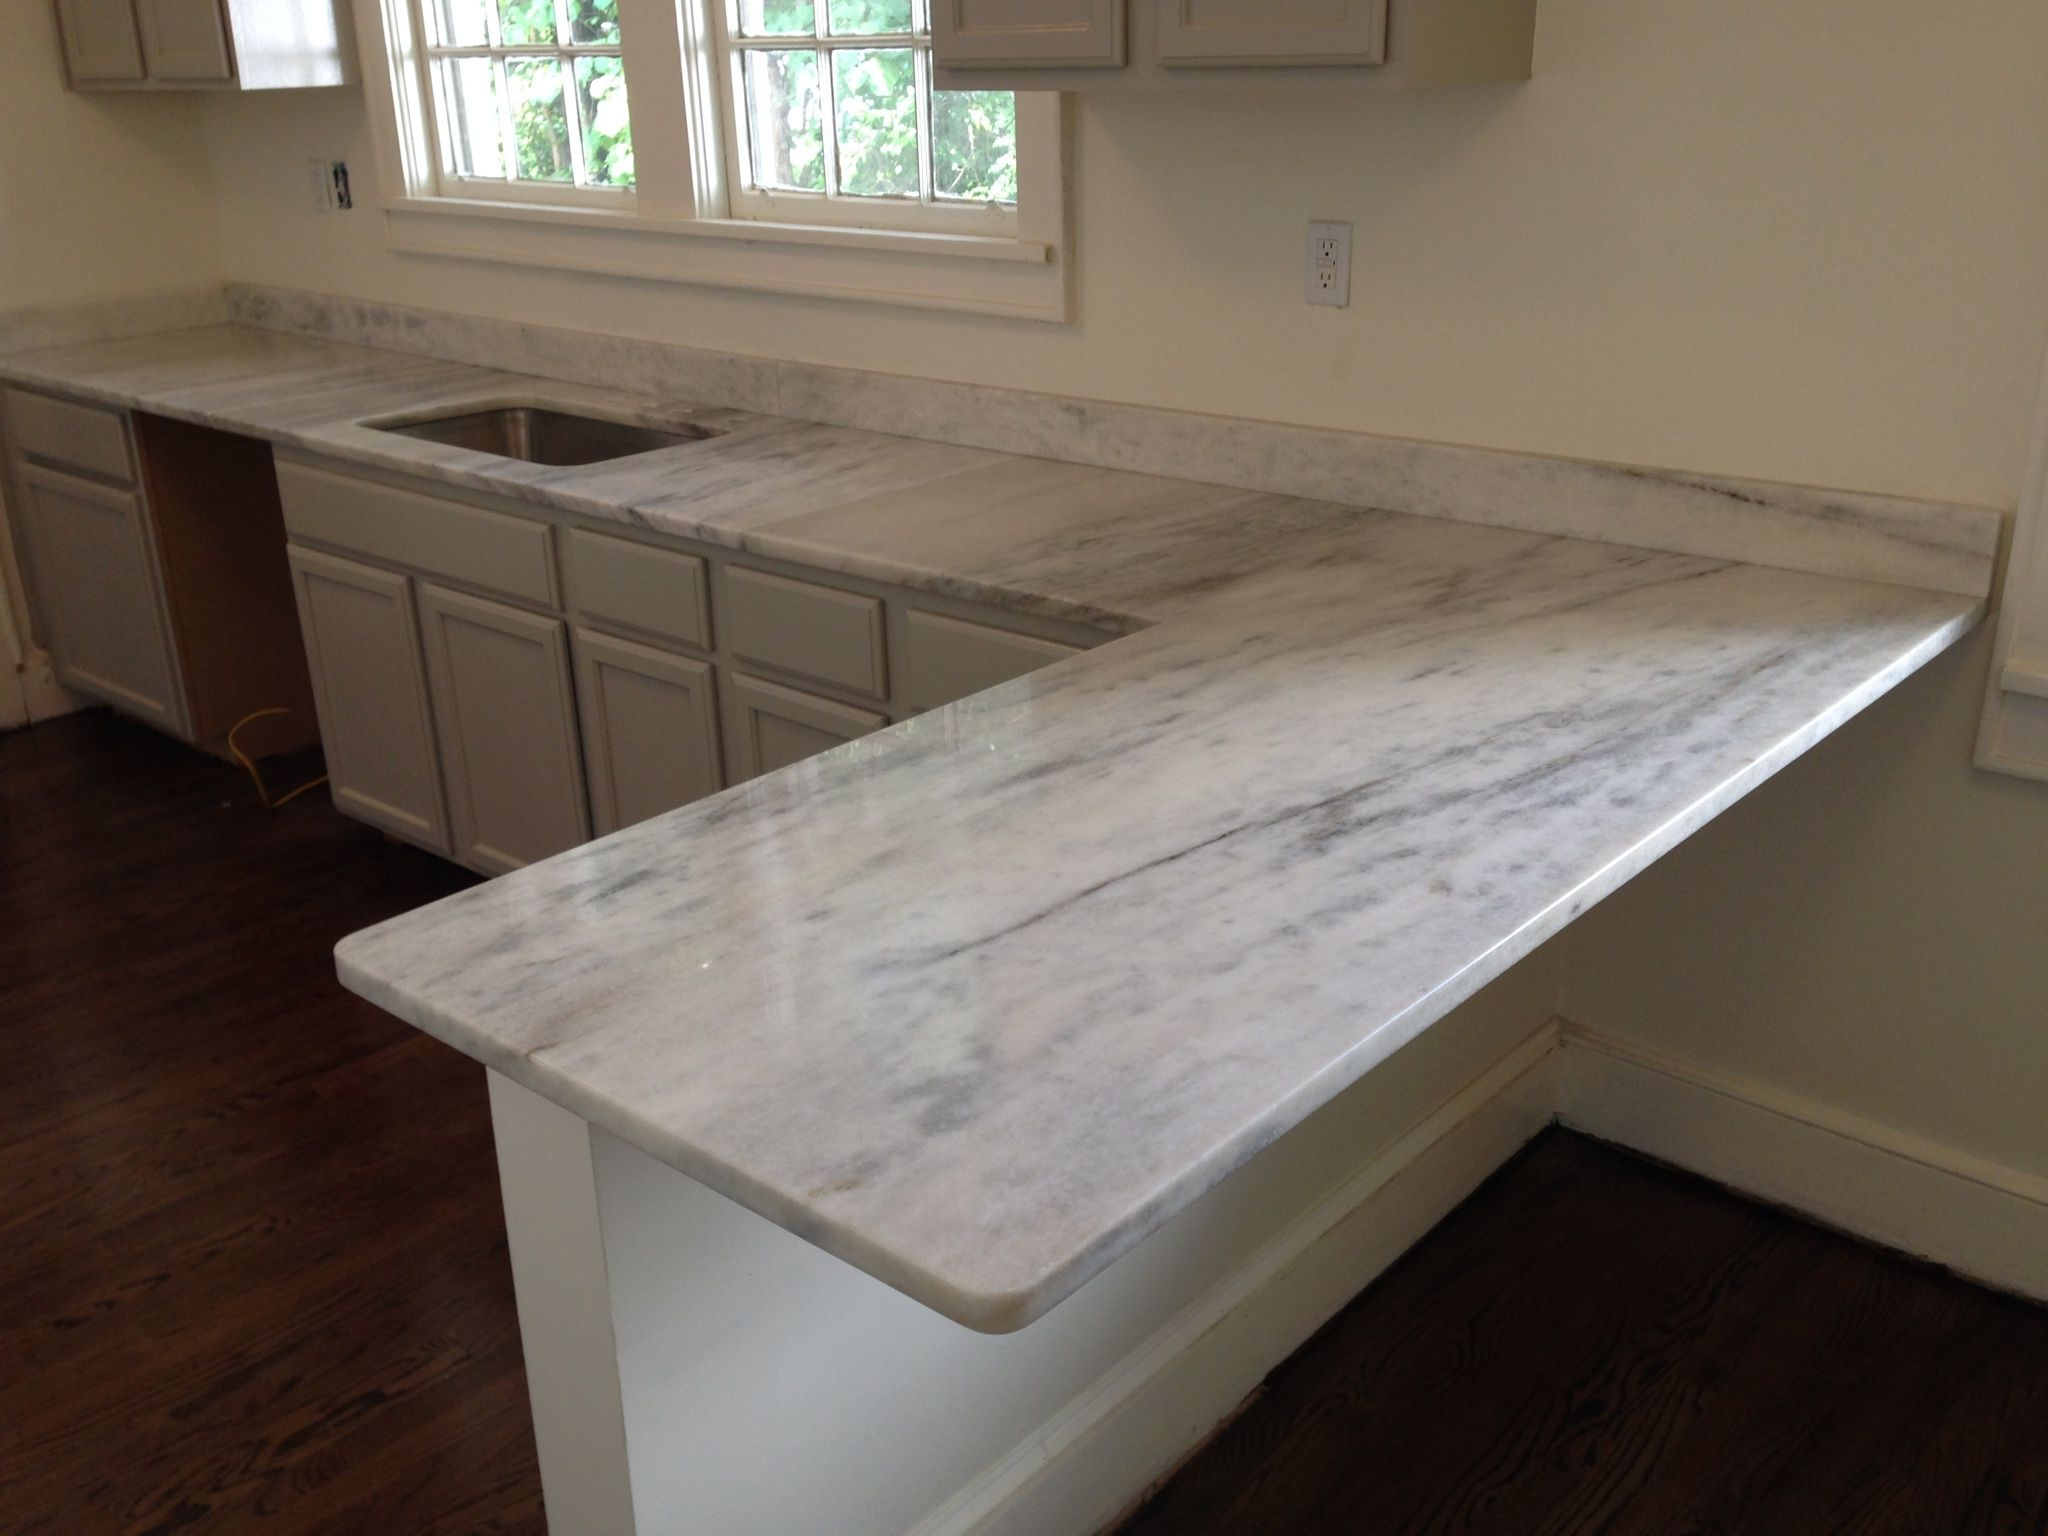 marble kitchen countertops Marble kitchen countertops Kitchen ideas Marble kitchen countertops White marble Similar to